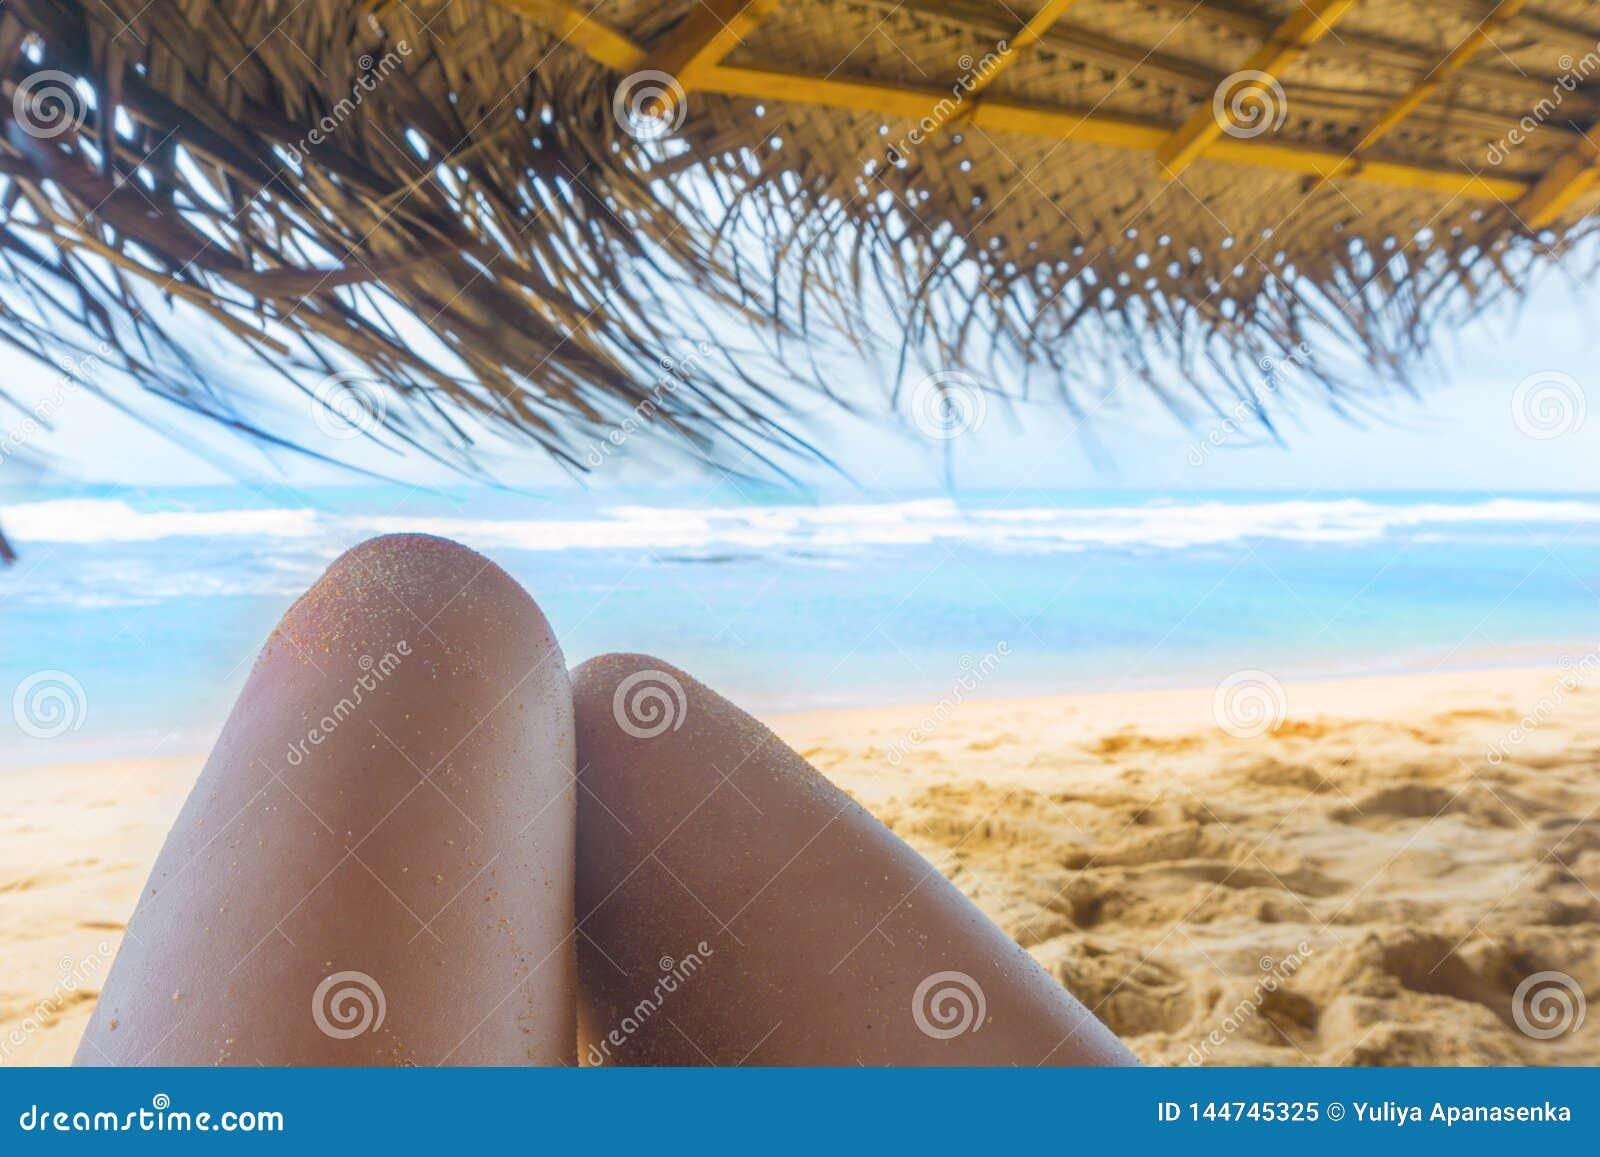 Kobiet nogi pod sunshade na pogodnej tropikalnej pla?y